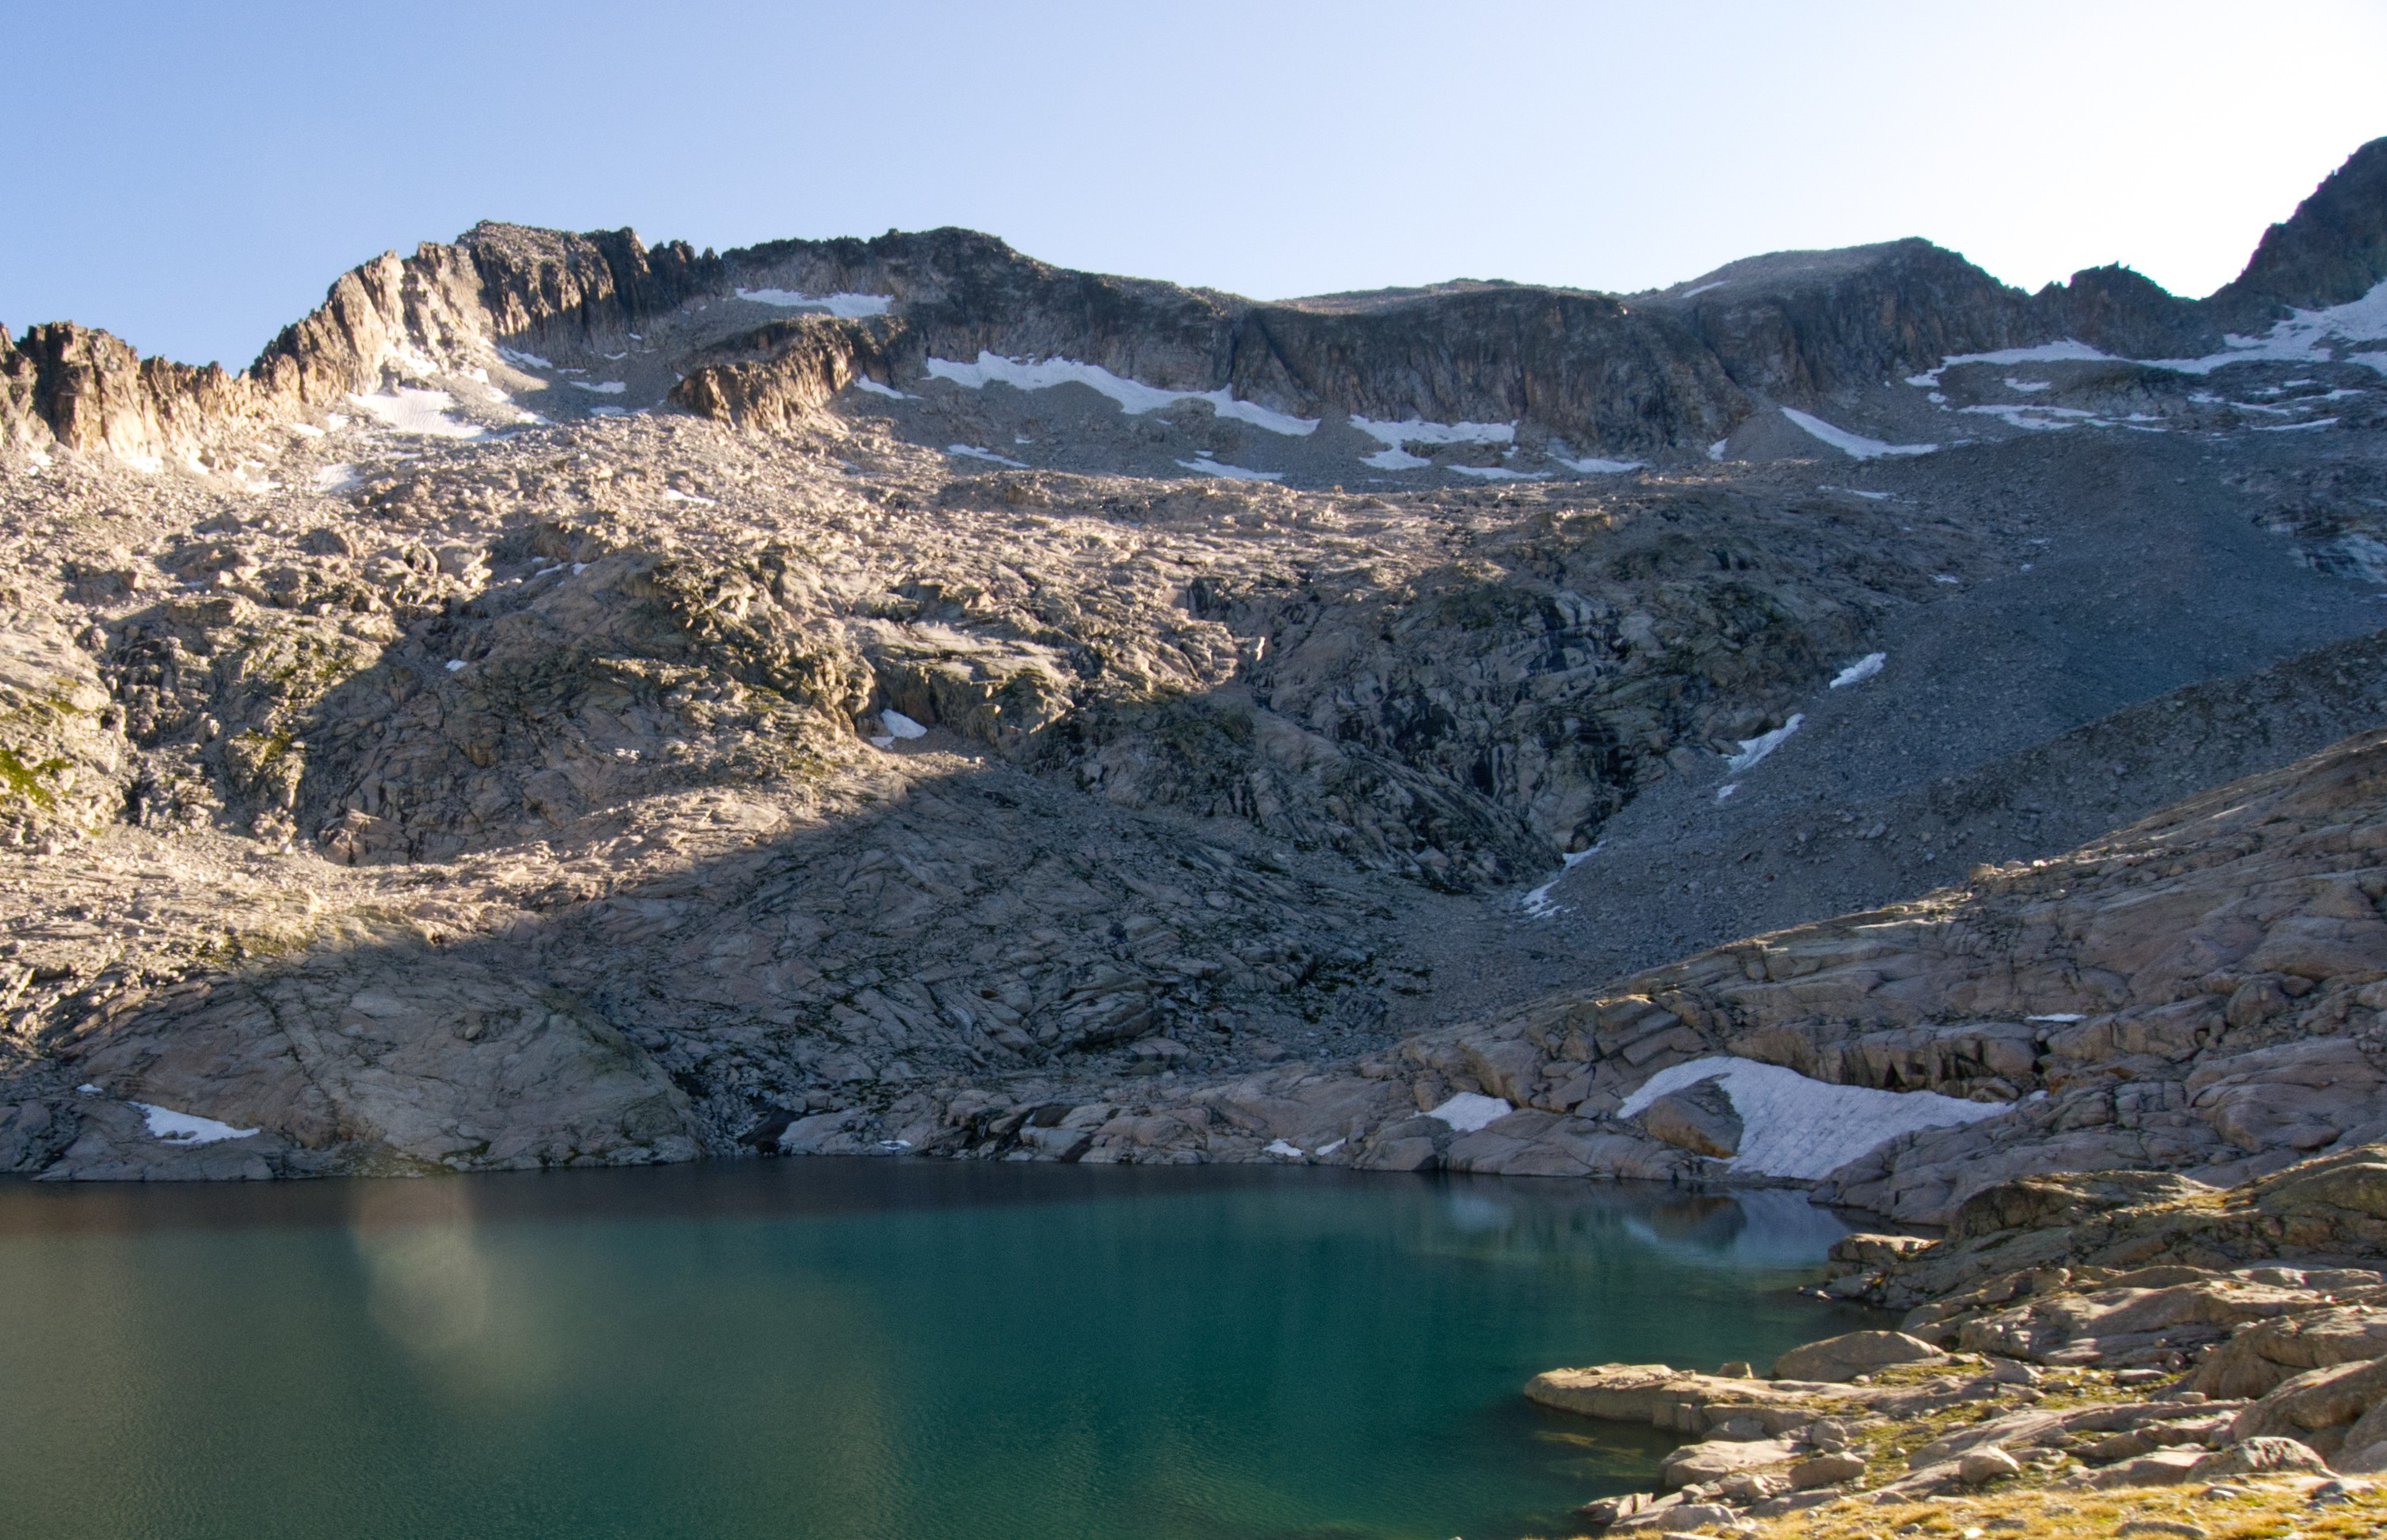 Ibón Alto de Coronas. Arriba, a la derecha, Collado de Coronas. Foto: Barrabeseo